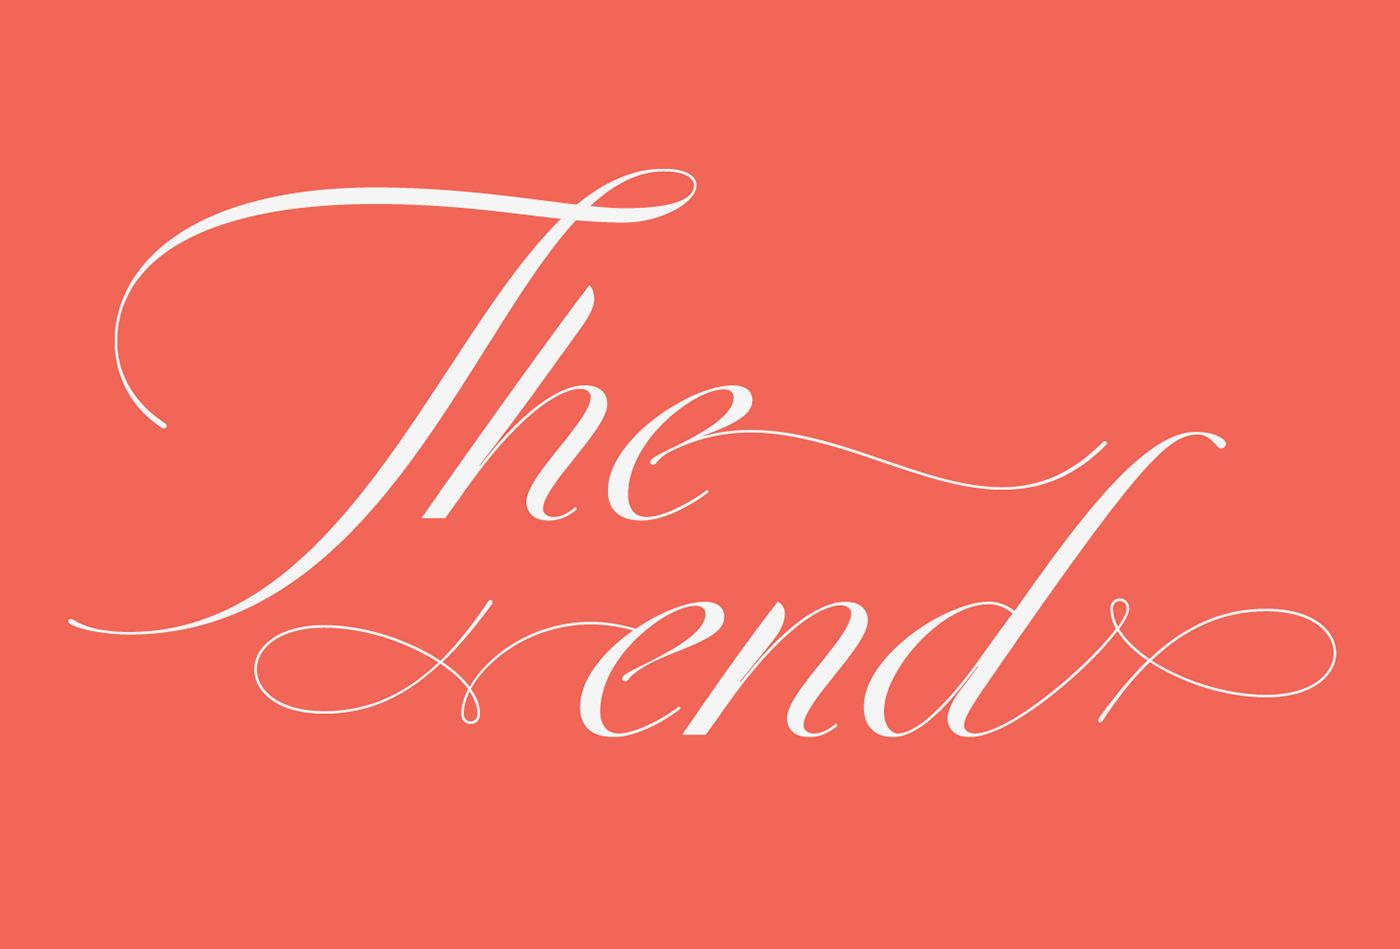 Script italic Swashes Typeface font DSType Pedro Leal